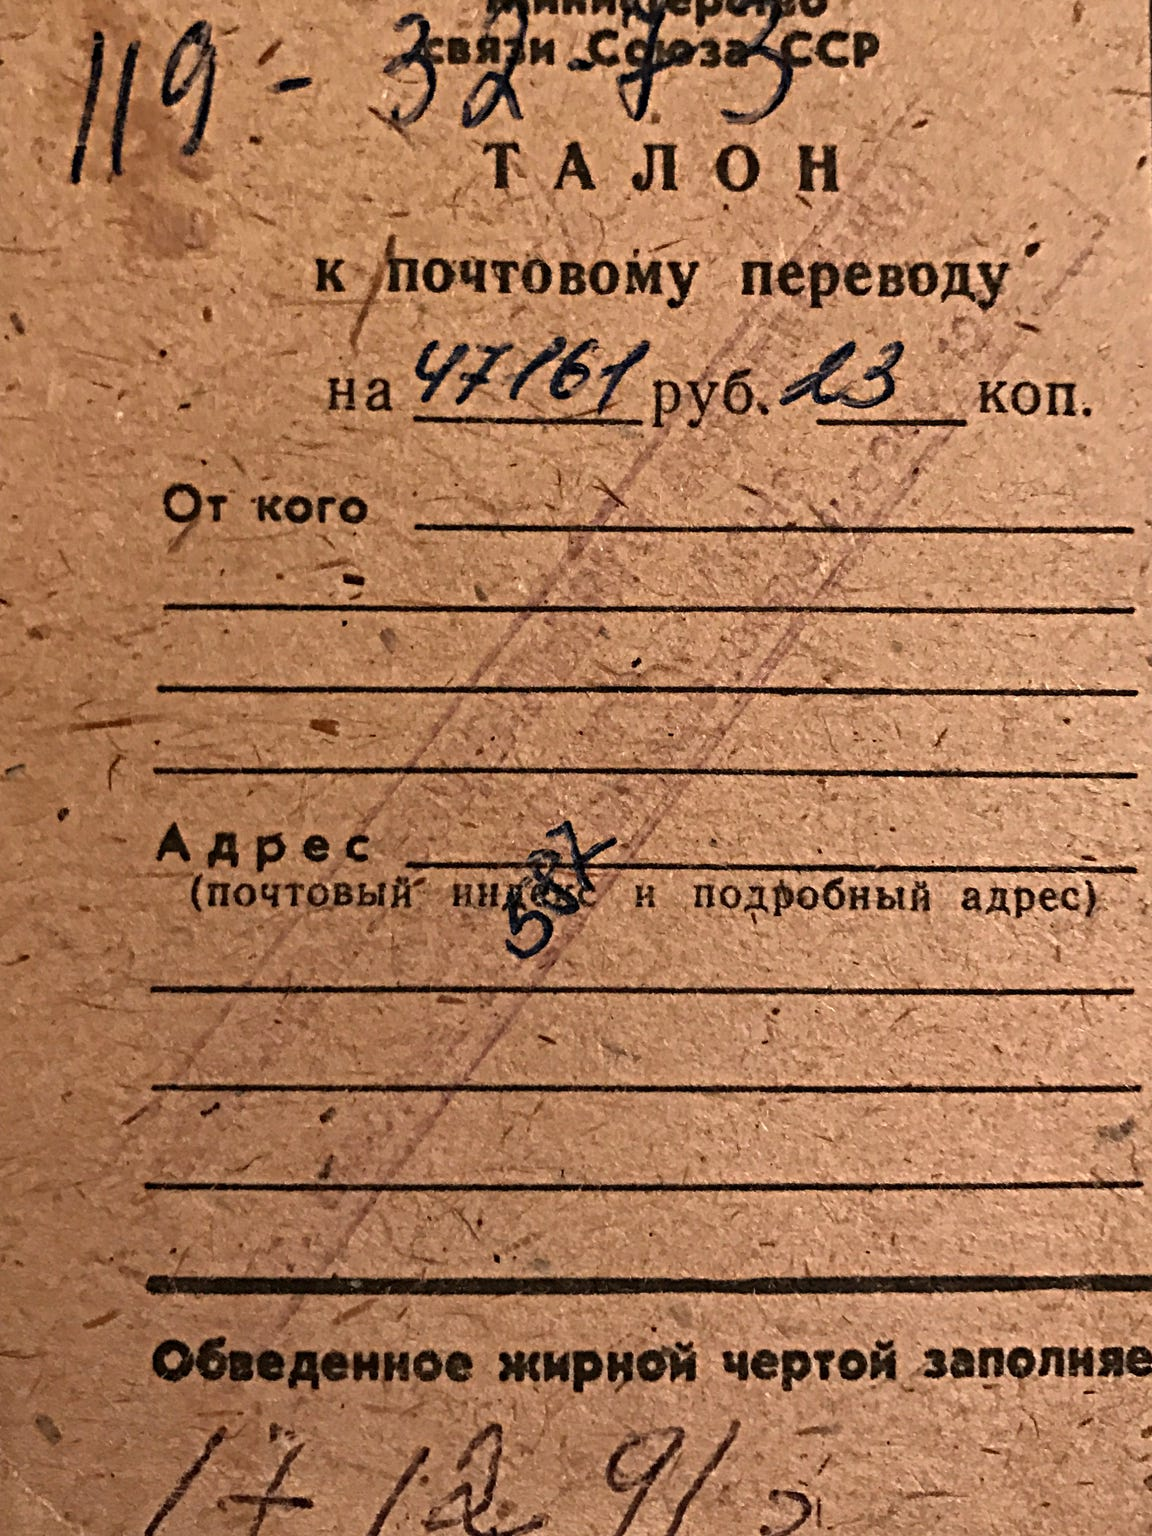 Lyudmila Alekseevna Khachatryan was compensated less